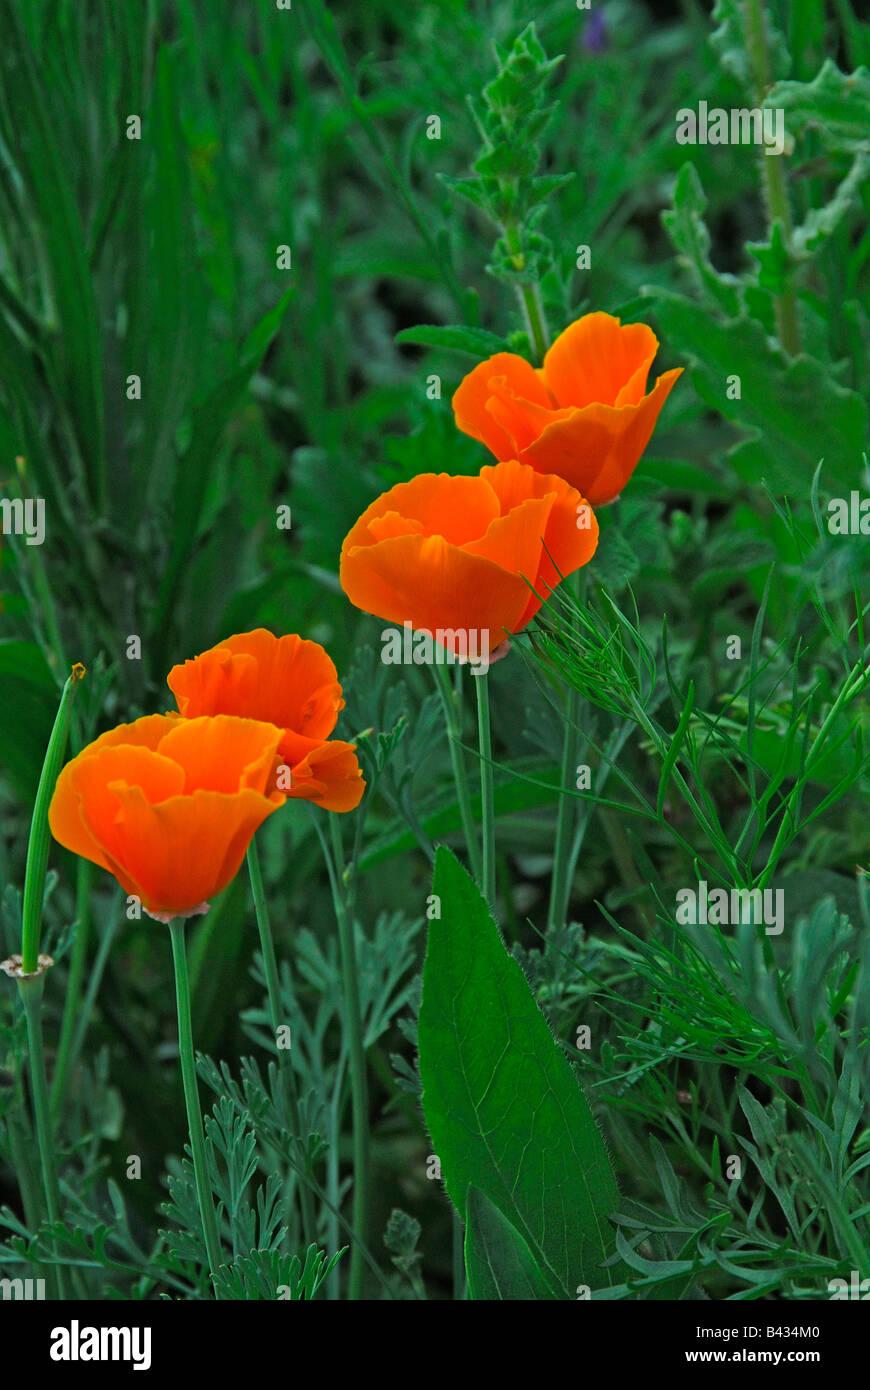 California Poppy (Eschscholzia californica), flowering - Stock Image